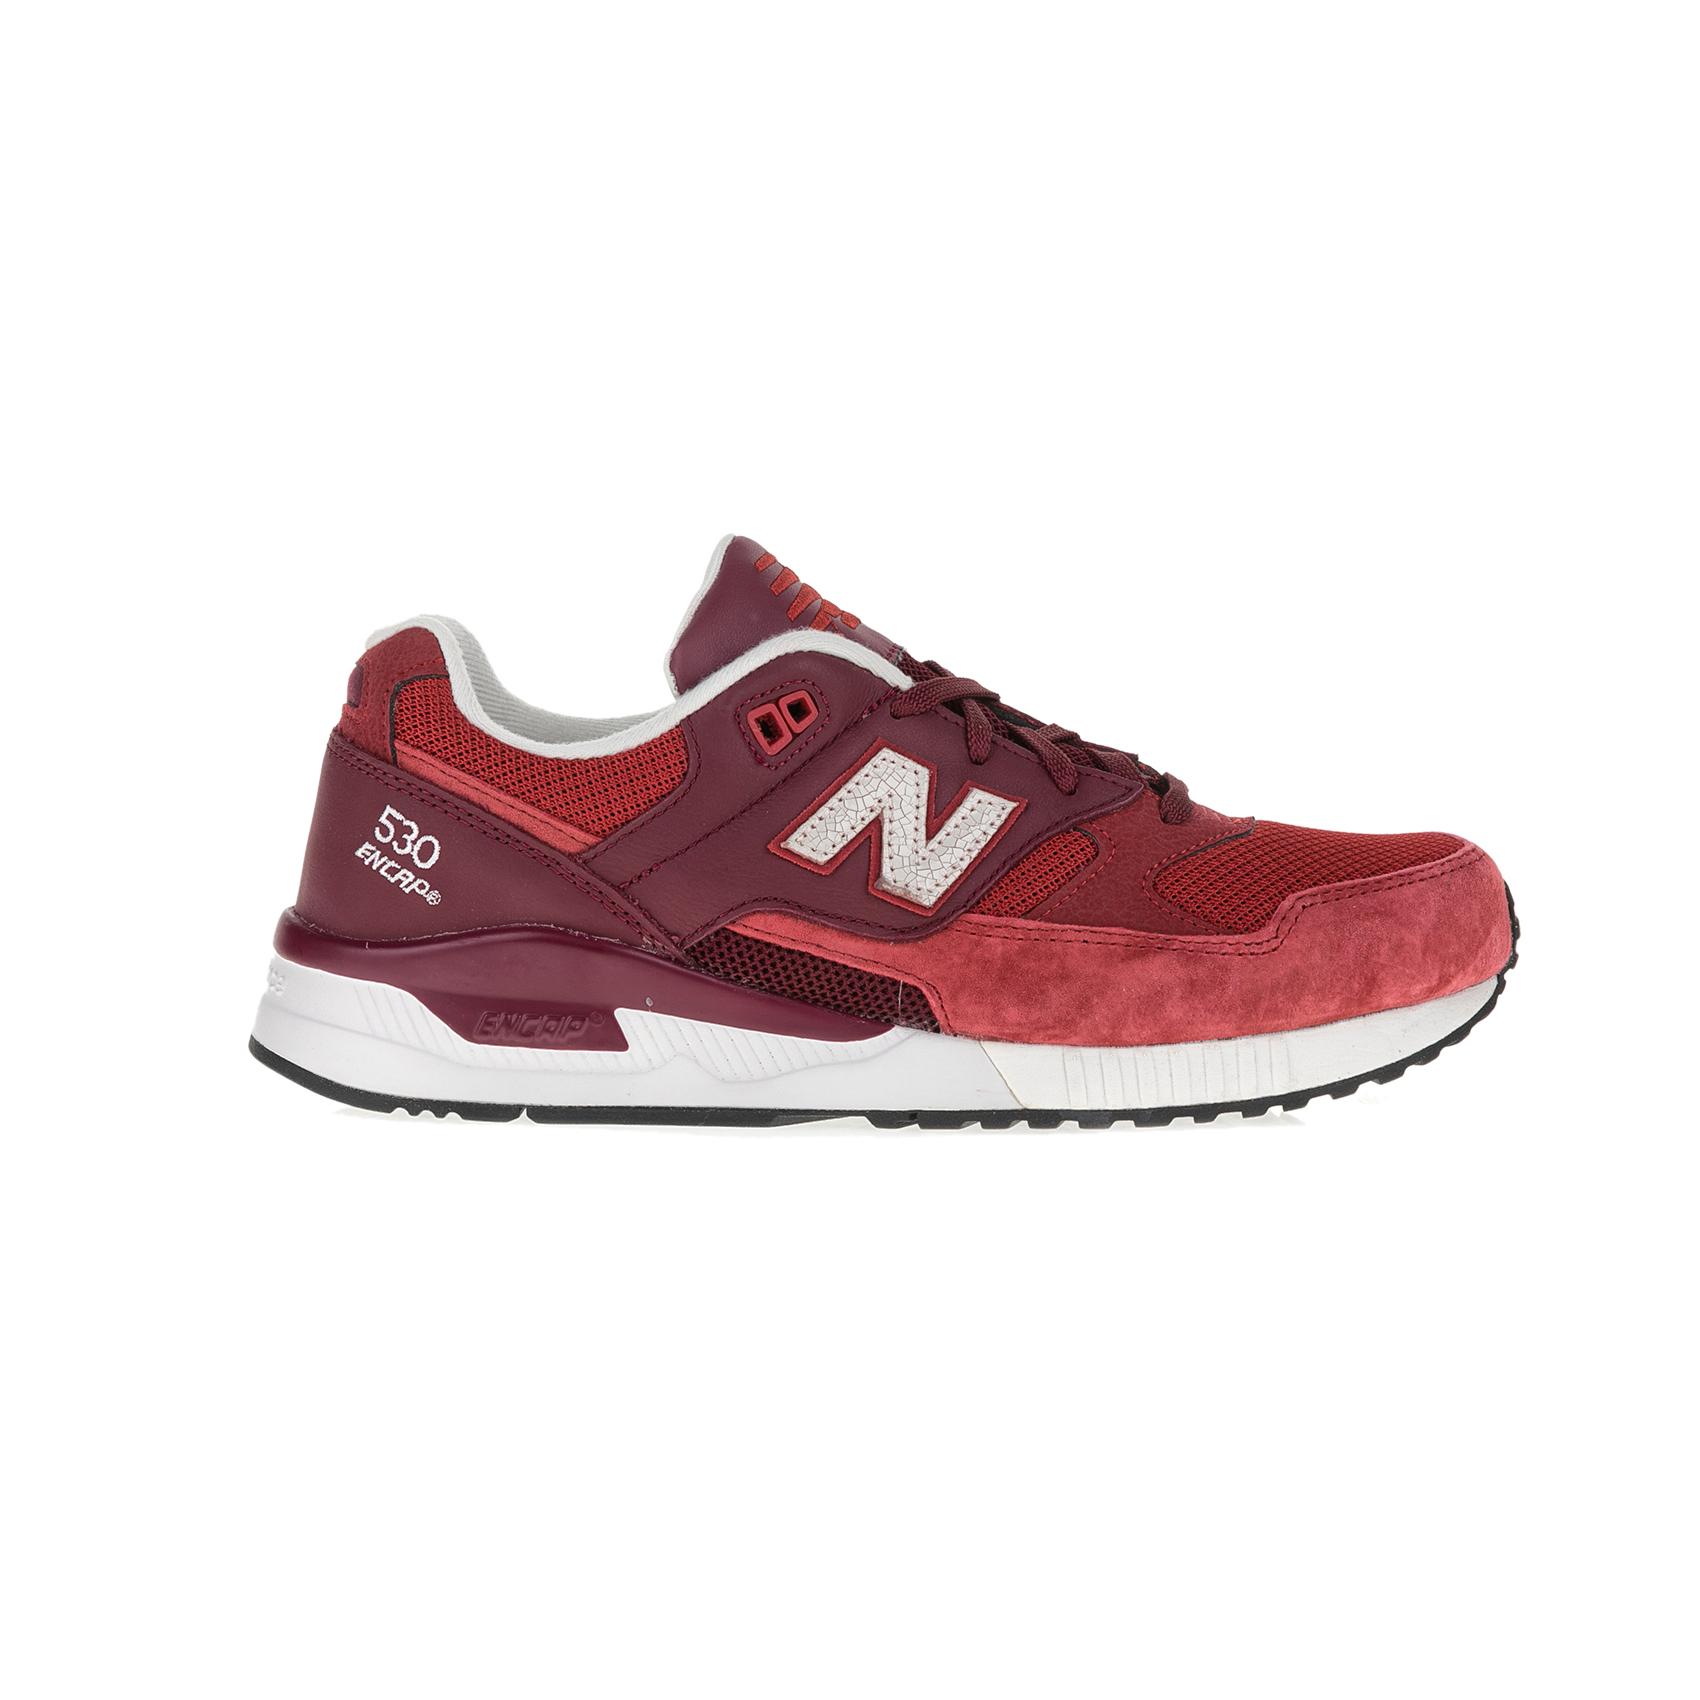 NEW BALANCE – Unisex παπούτσια NEW BALANCE M530OXB κόκκινα